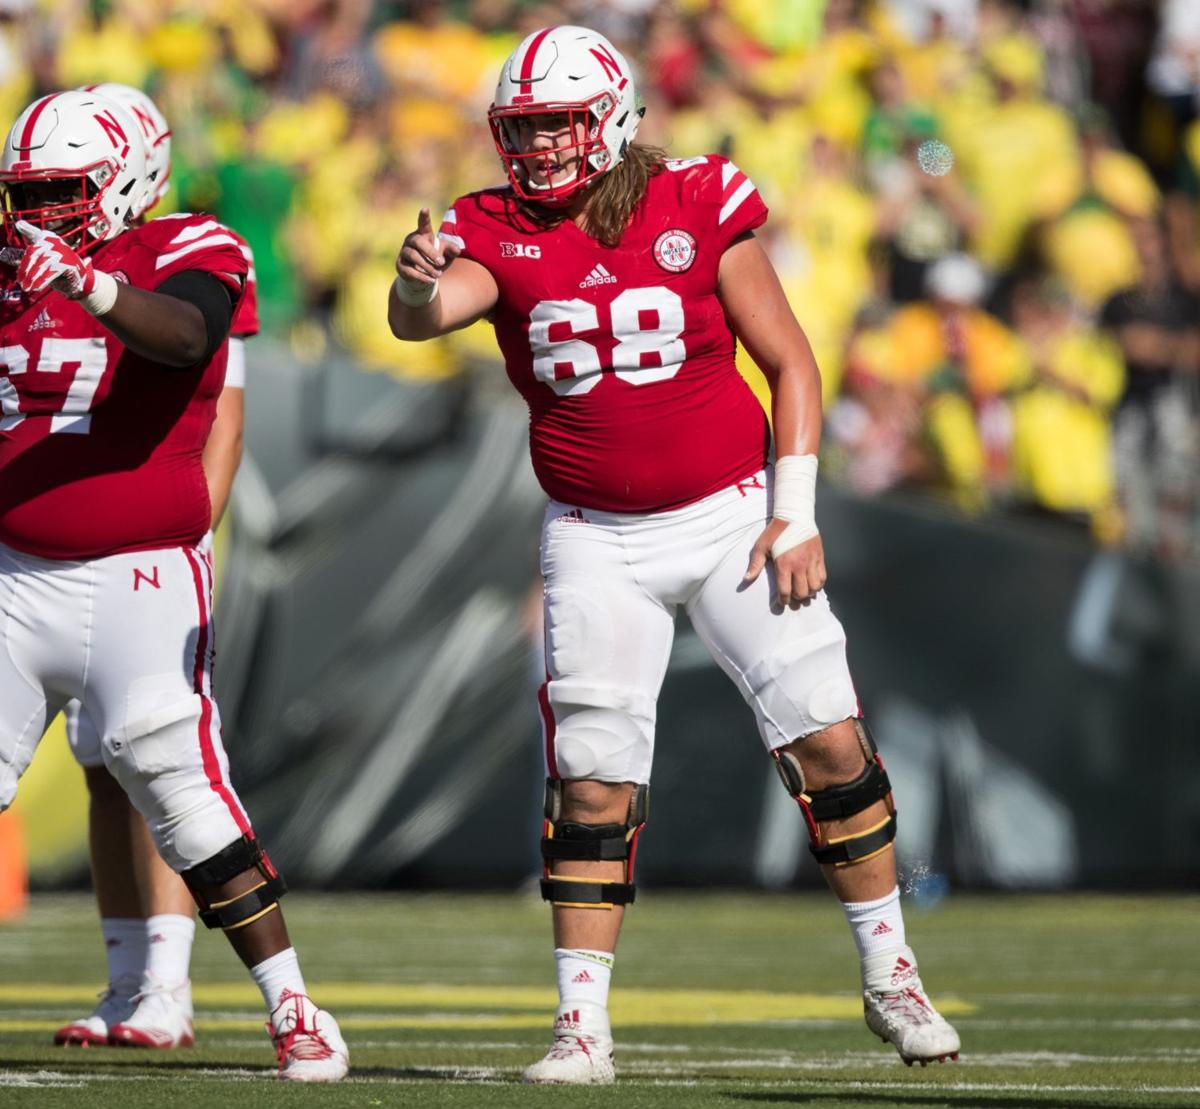 Nebraska Football: Two Huskers Headline All-Big Ten